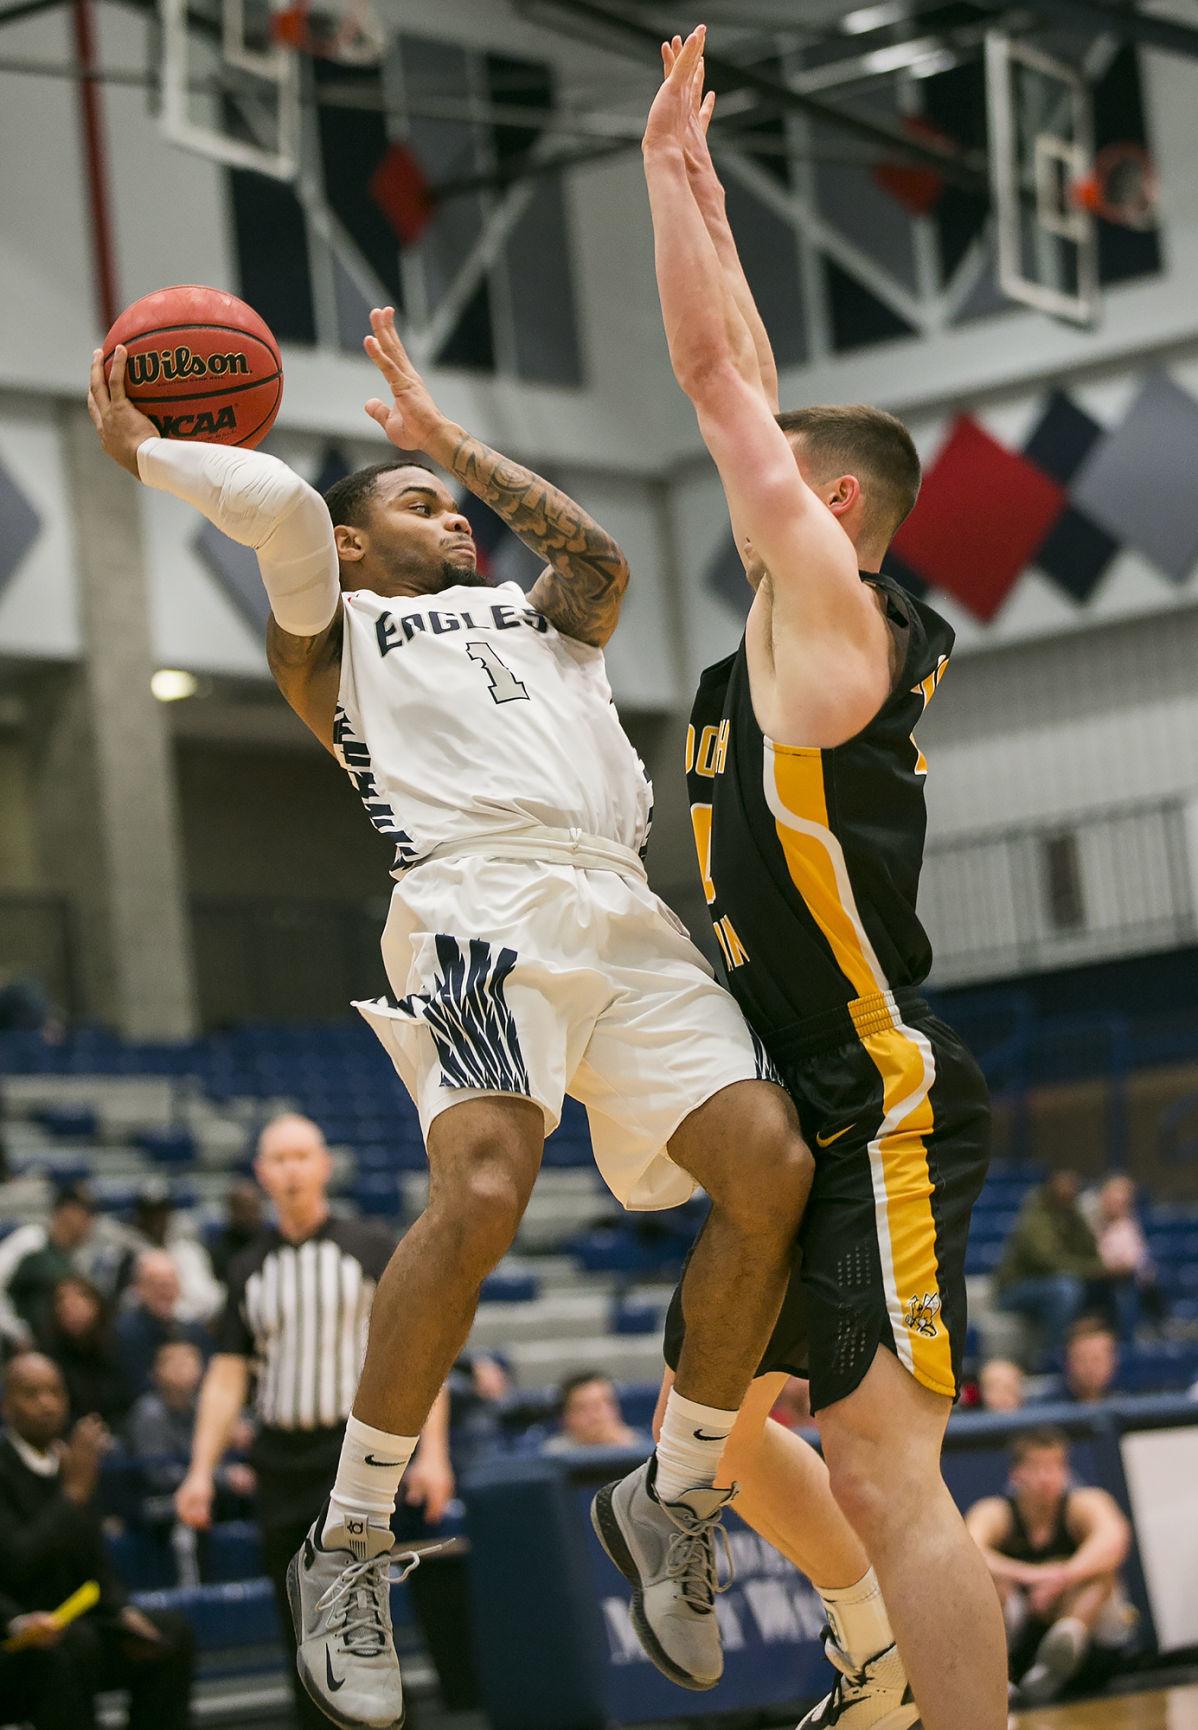 Randolph-Macon at UMW men's basketball